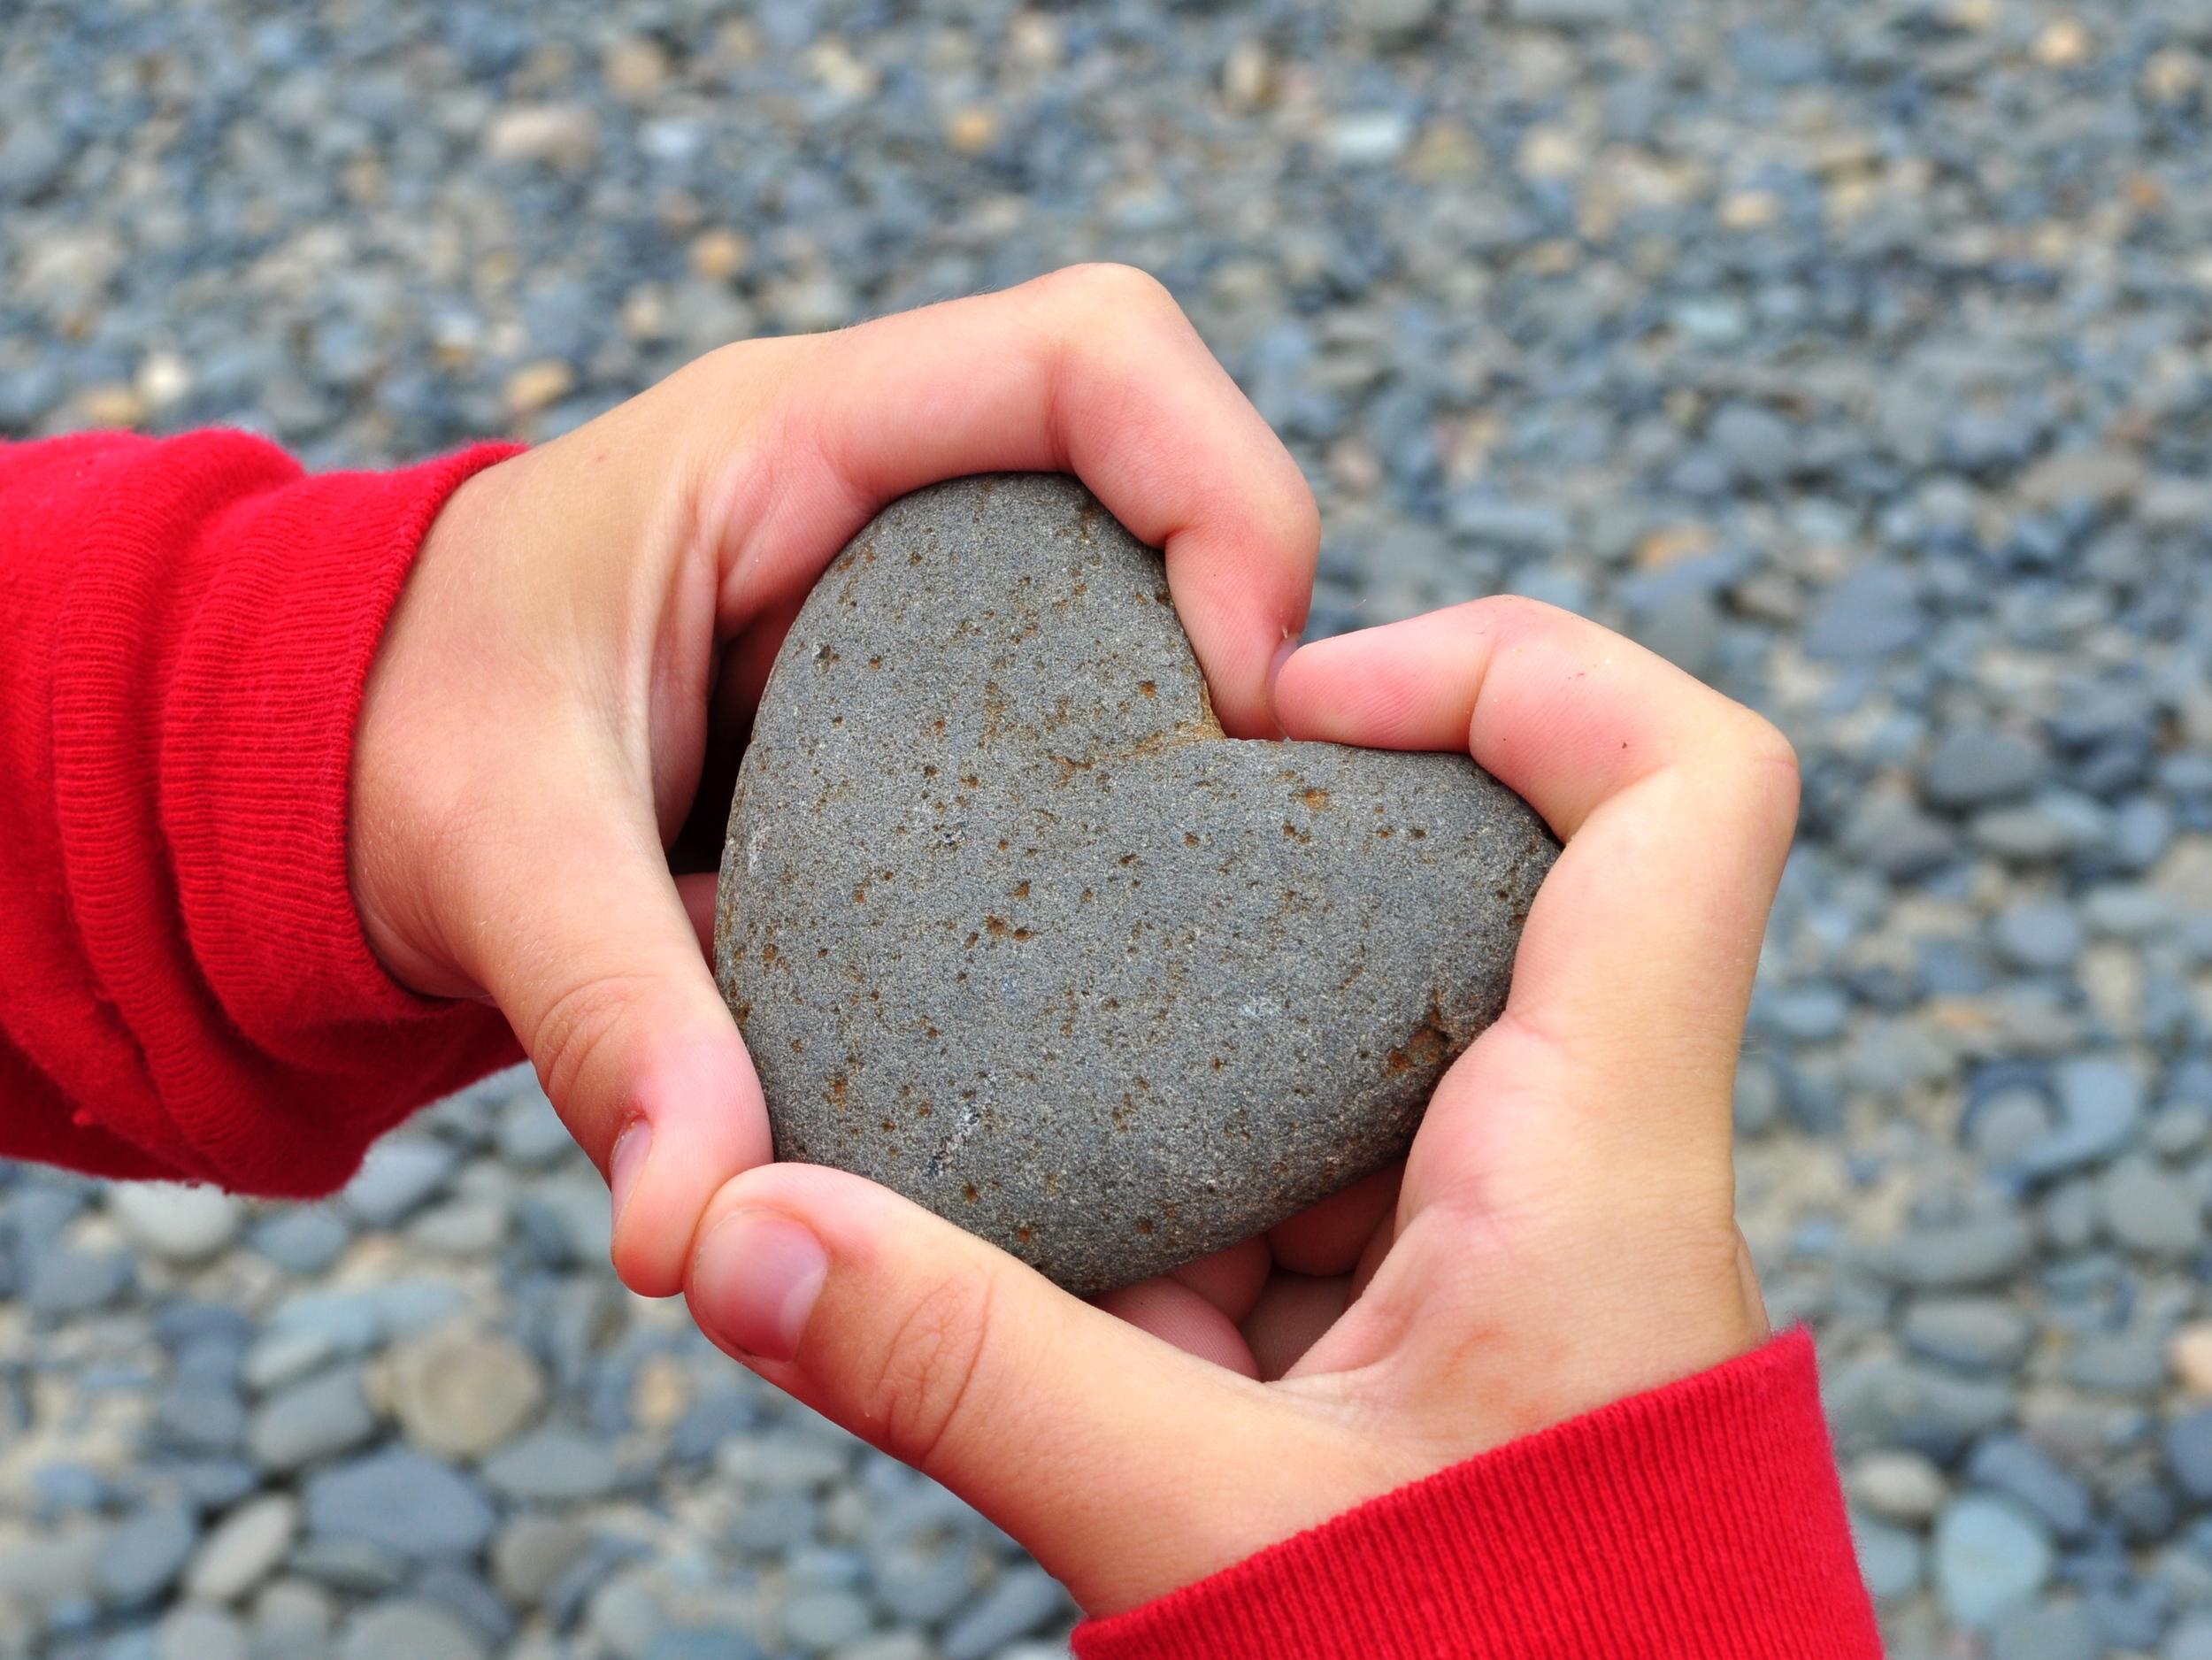 "ock Heart ""Rock in Child's Hand,"" Lisa L. Weidmeier, Flickr"